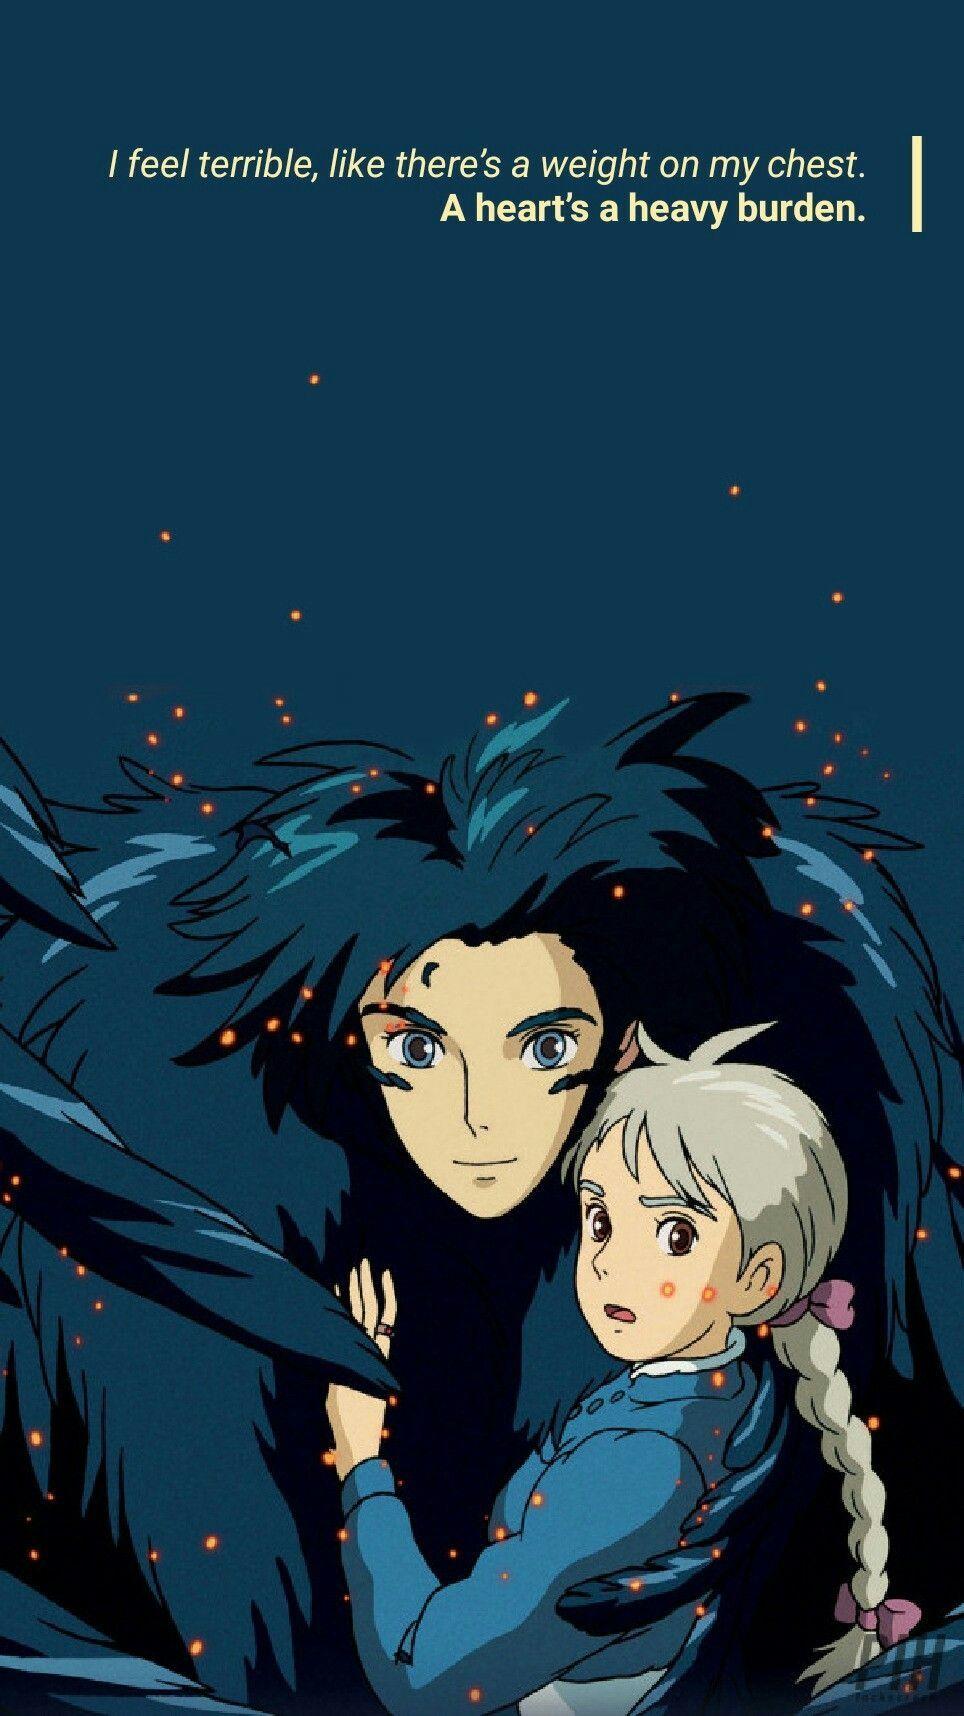 The Walking Castle Howl 39 S Moving Castle Anime Studio Ghibli Wallpaper Loc Anime Castle Ghibl Ghibli Artwork Studio Ghibli Characters Ghibli Art